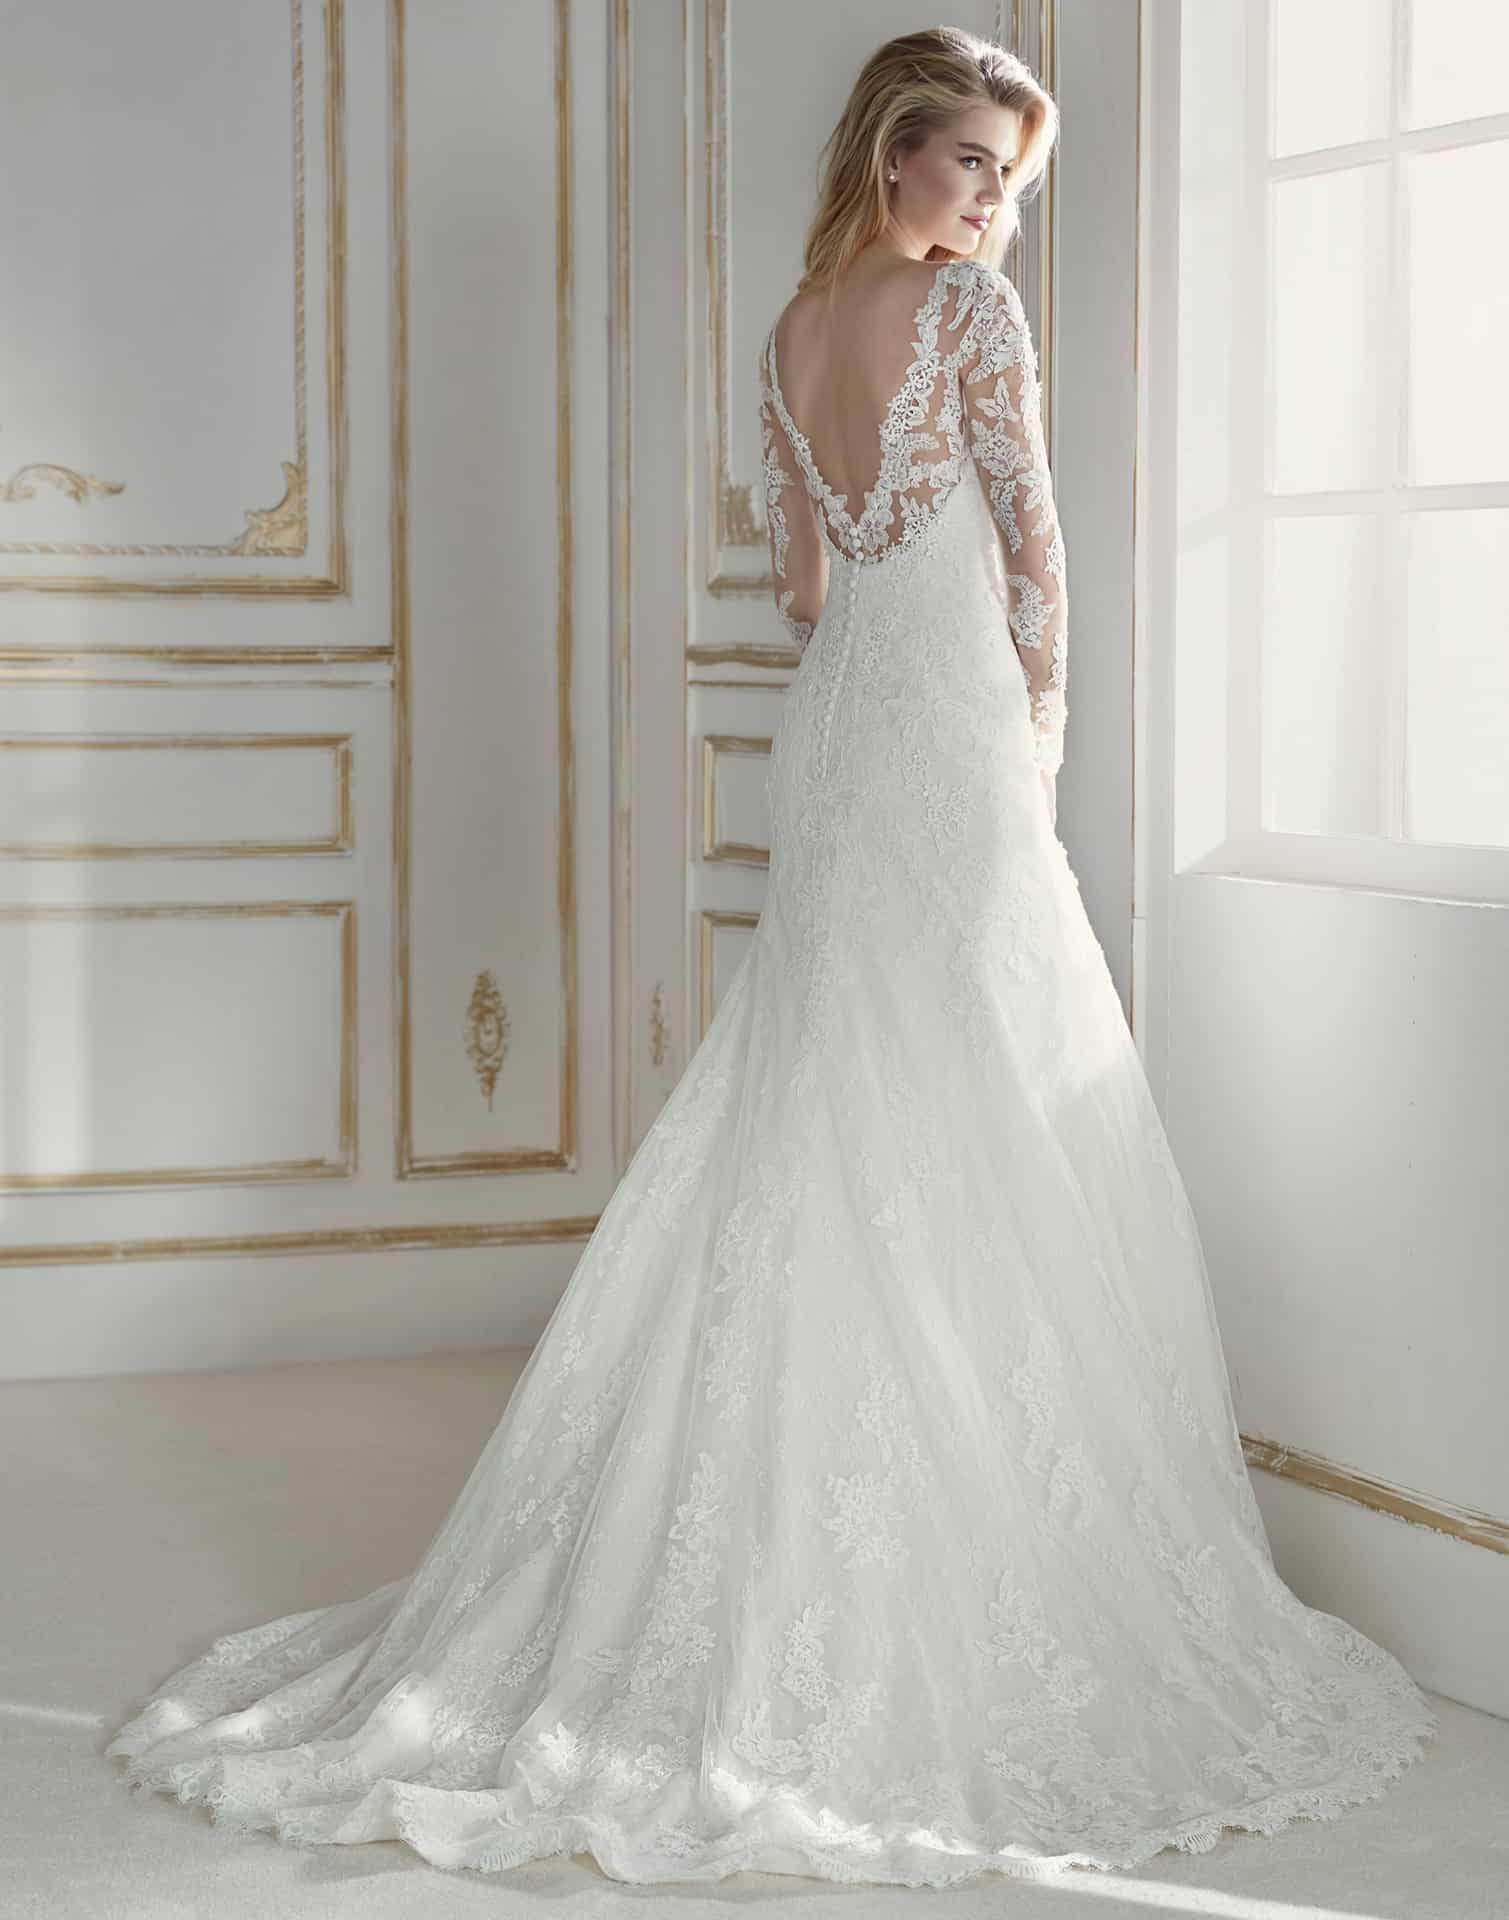 Wedding Dresses Gallery 46